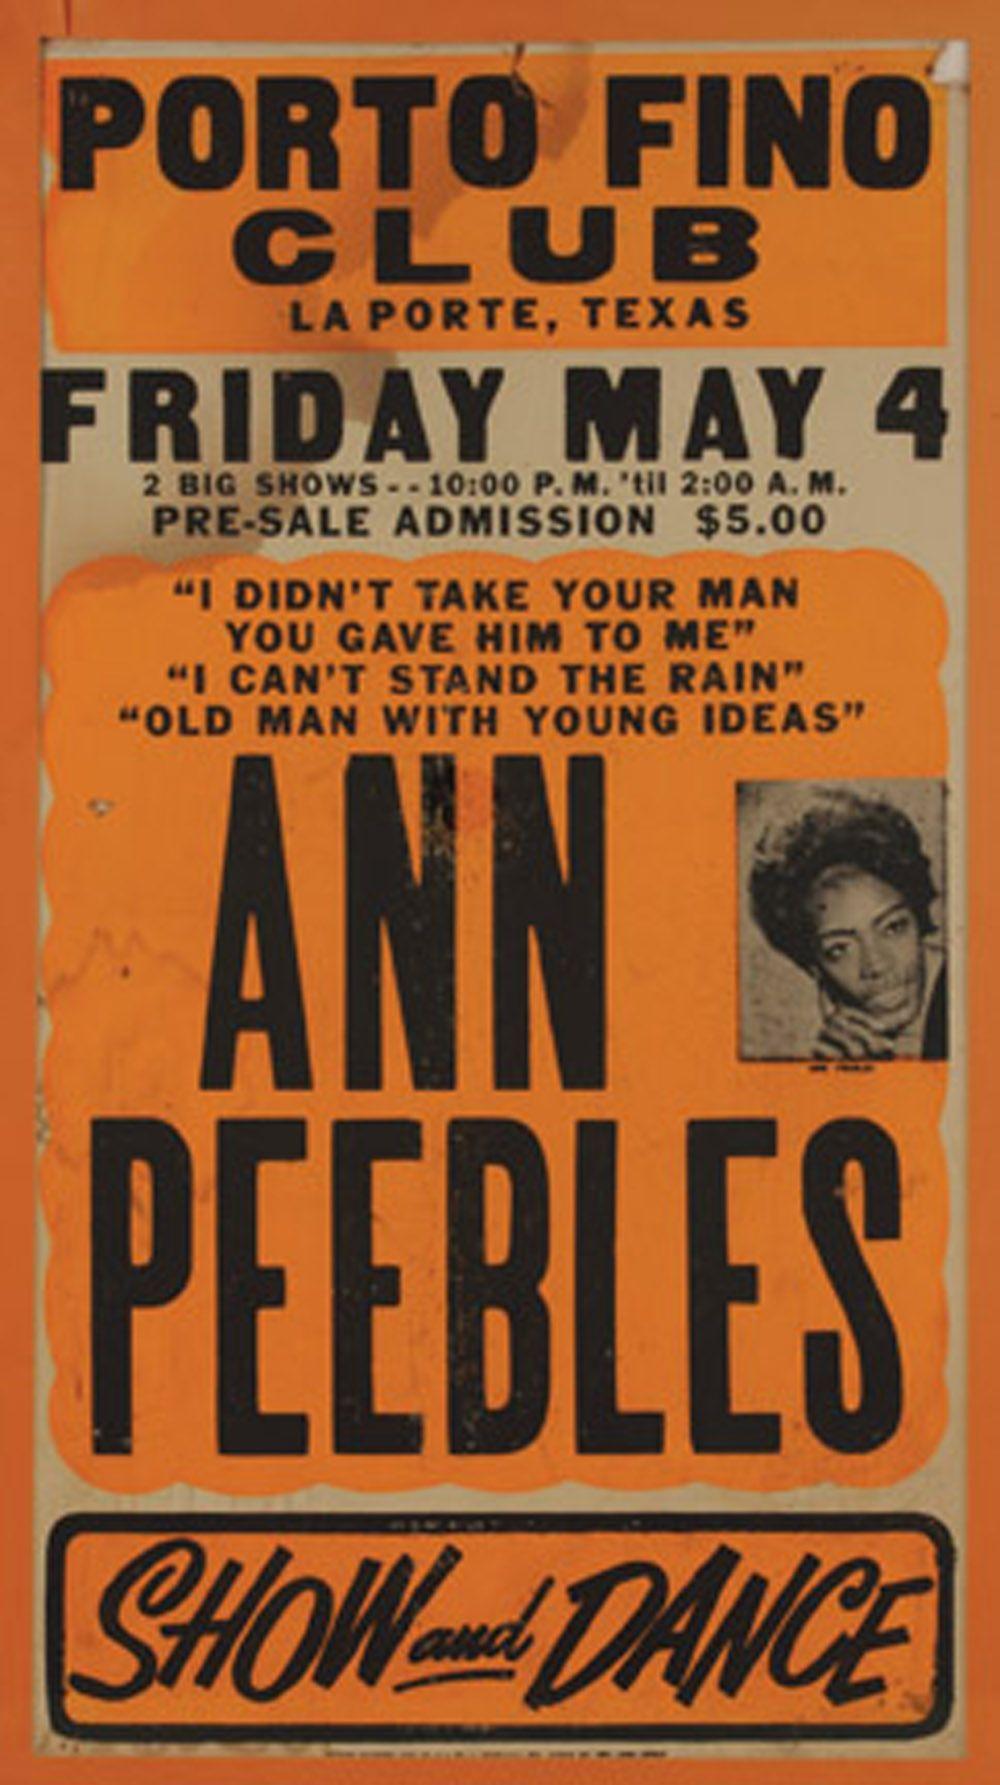 Ann Peebles | Concert posters, Music concert posters, Vintage music posters